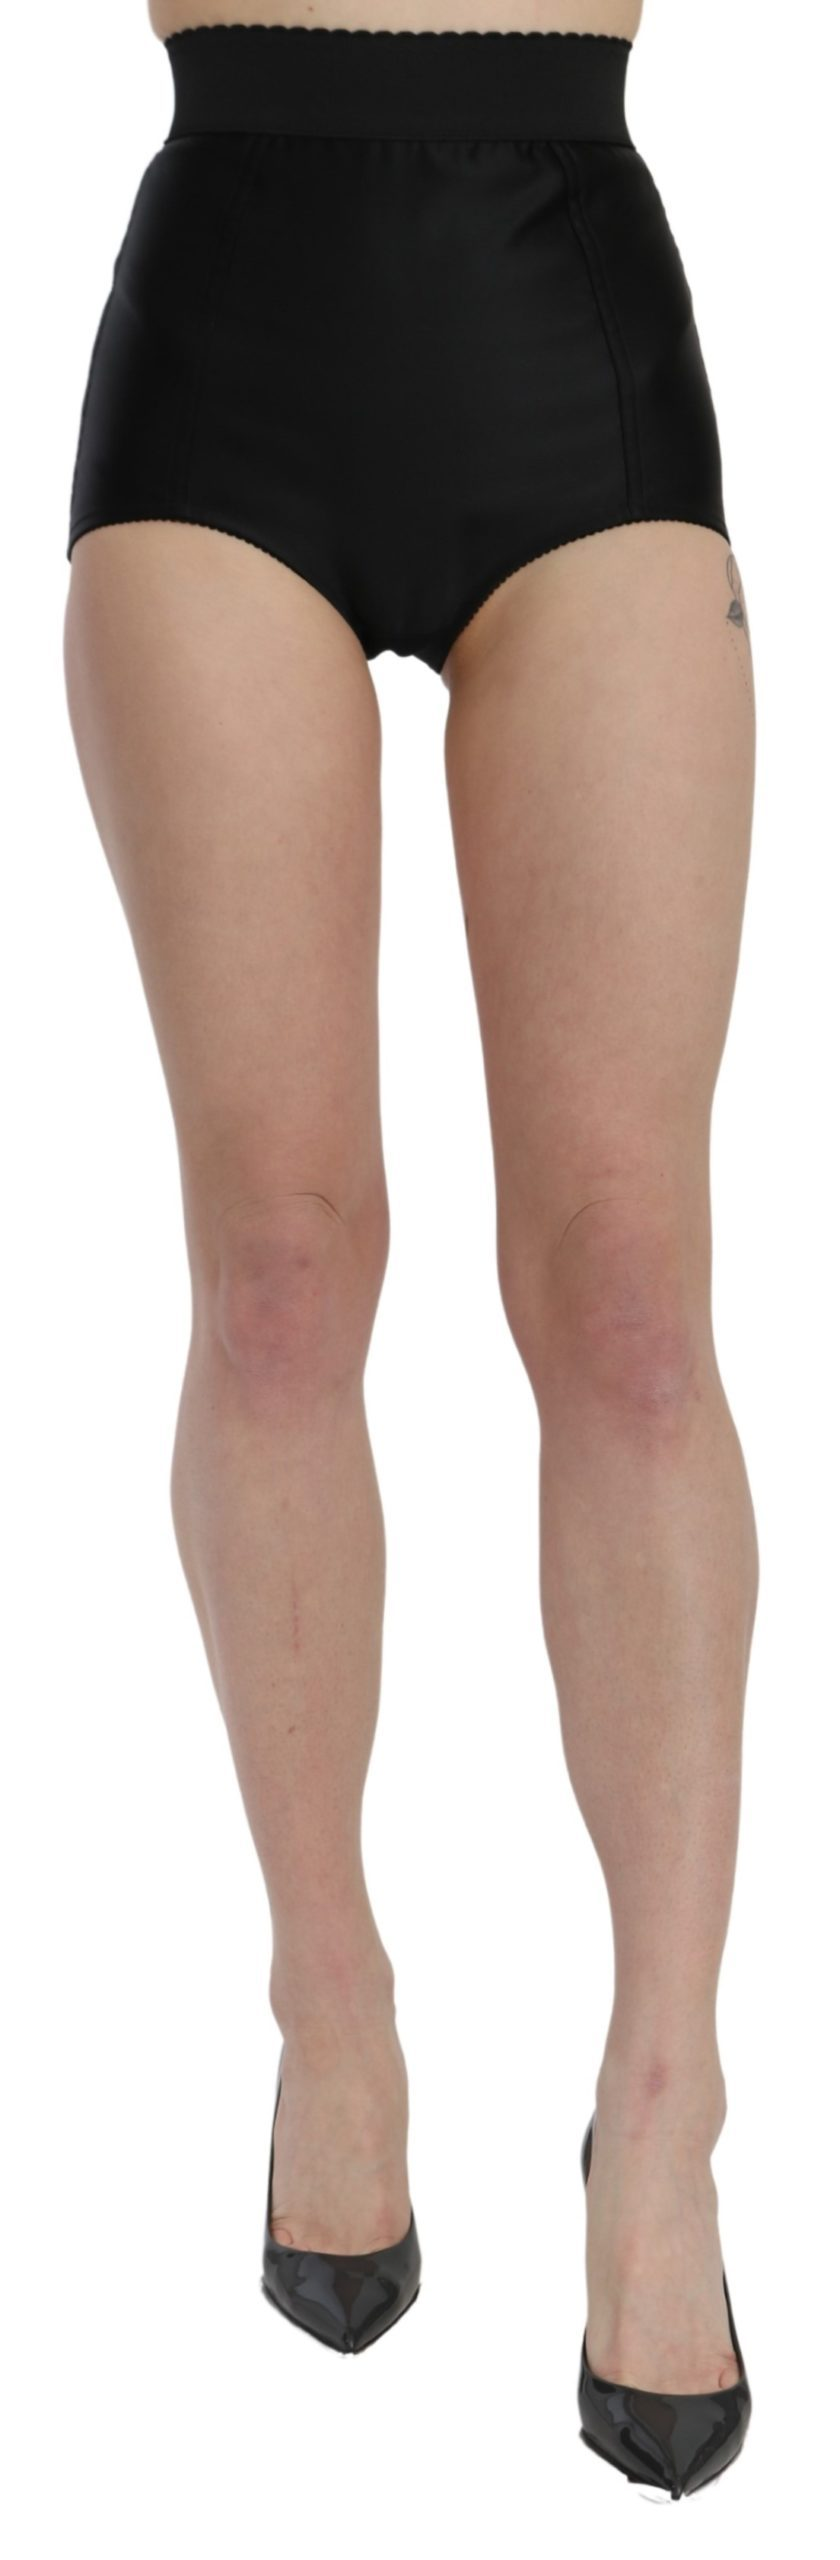 Dolce & Gabbana Women's High Waist Mini Hot Pants Nylon Shorts Black SKI1441 - IT36 | XS